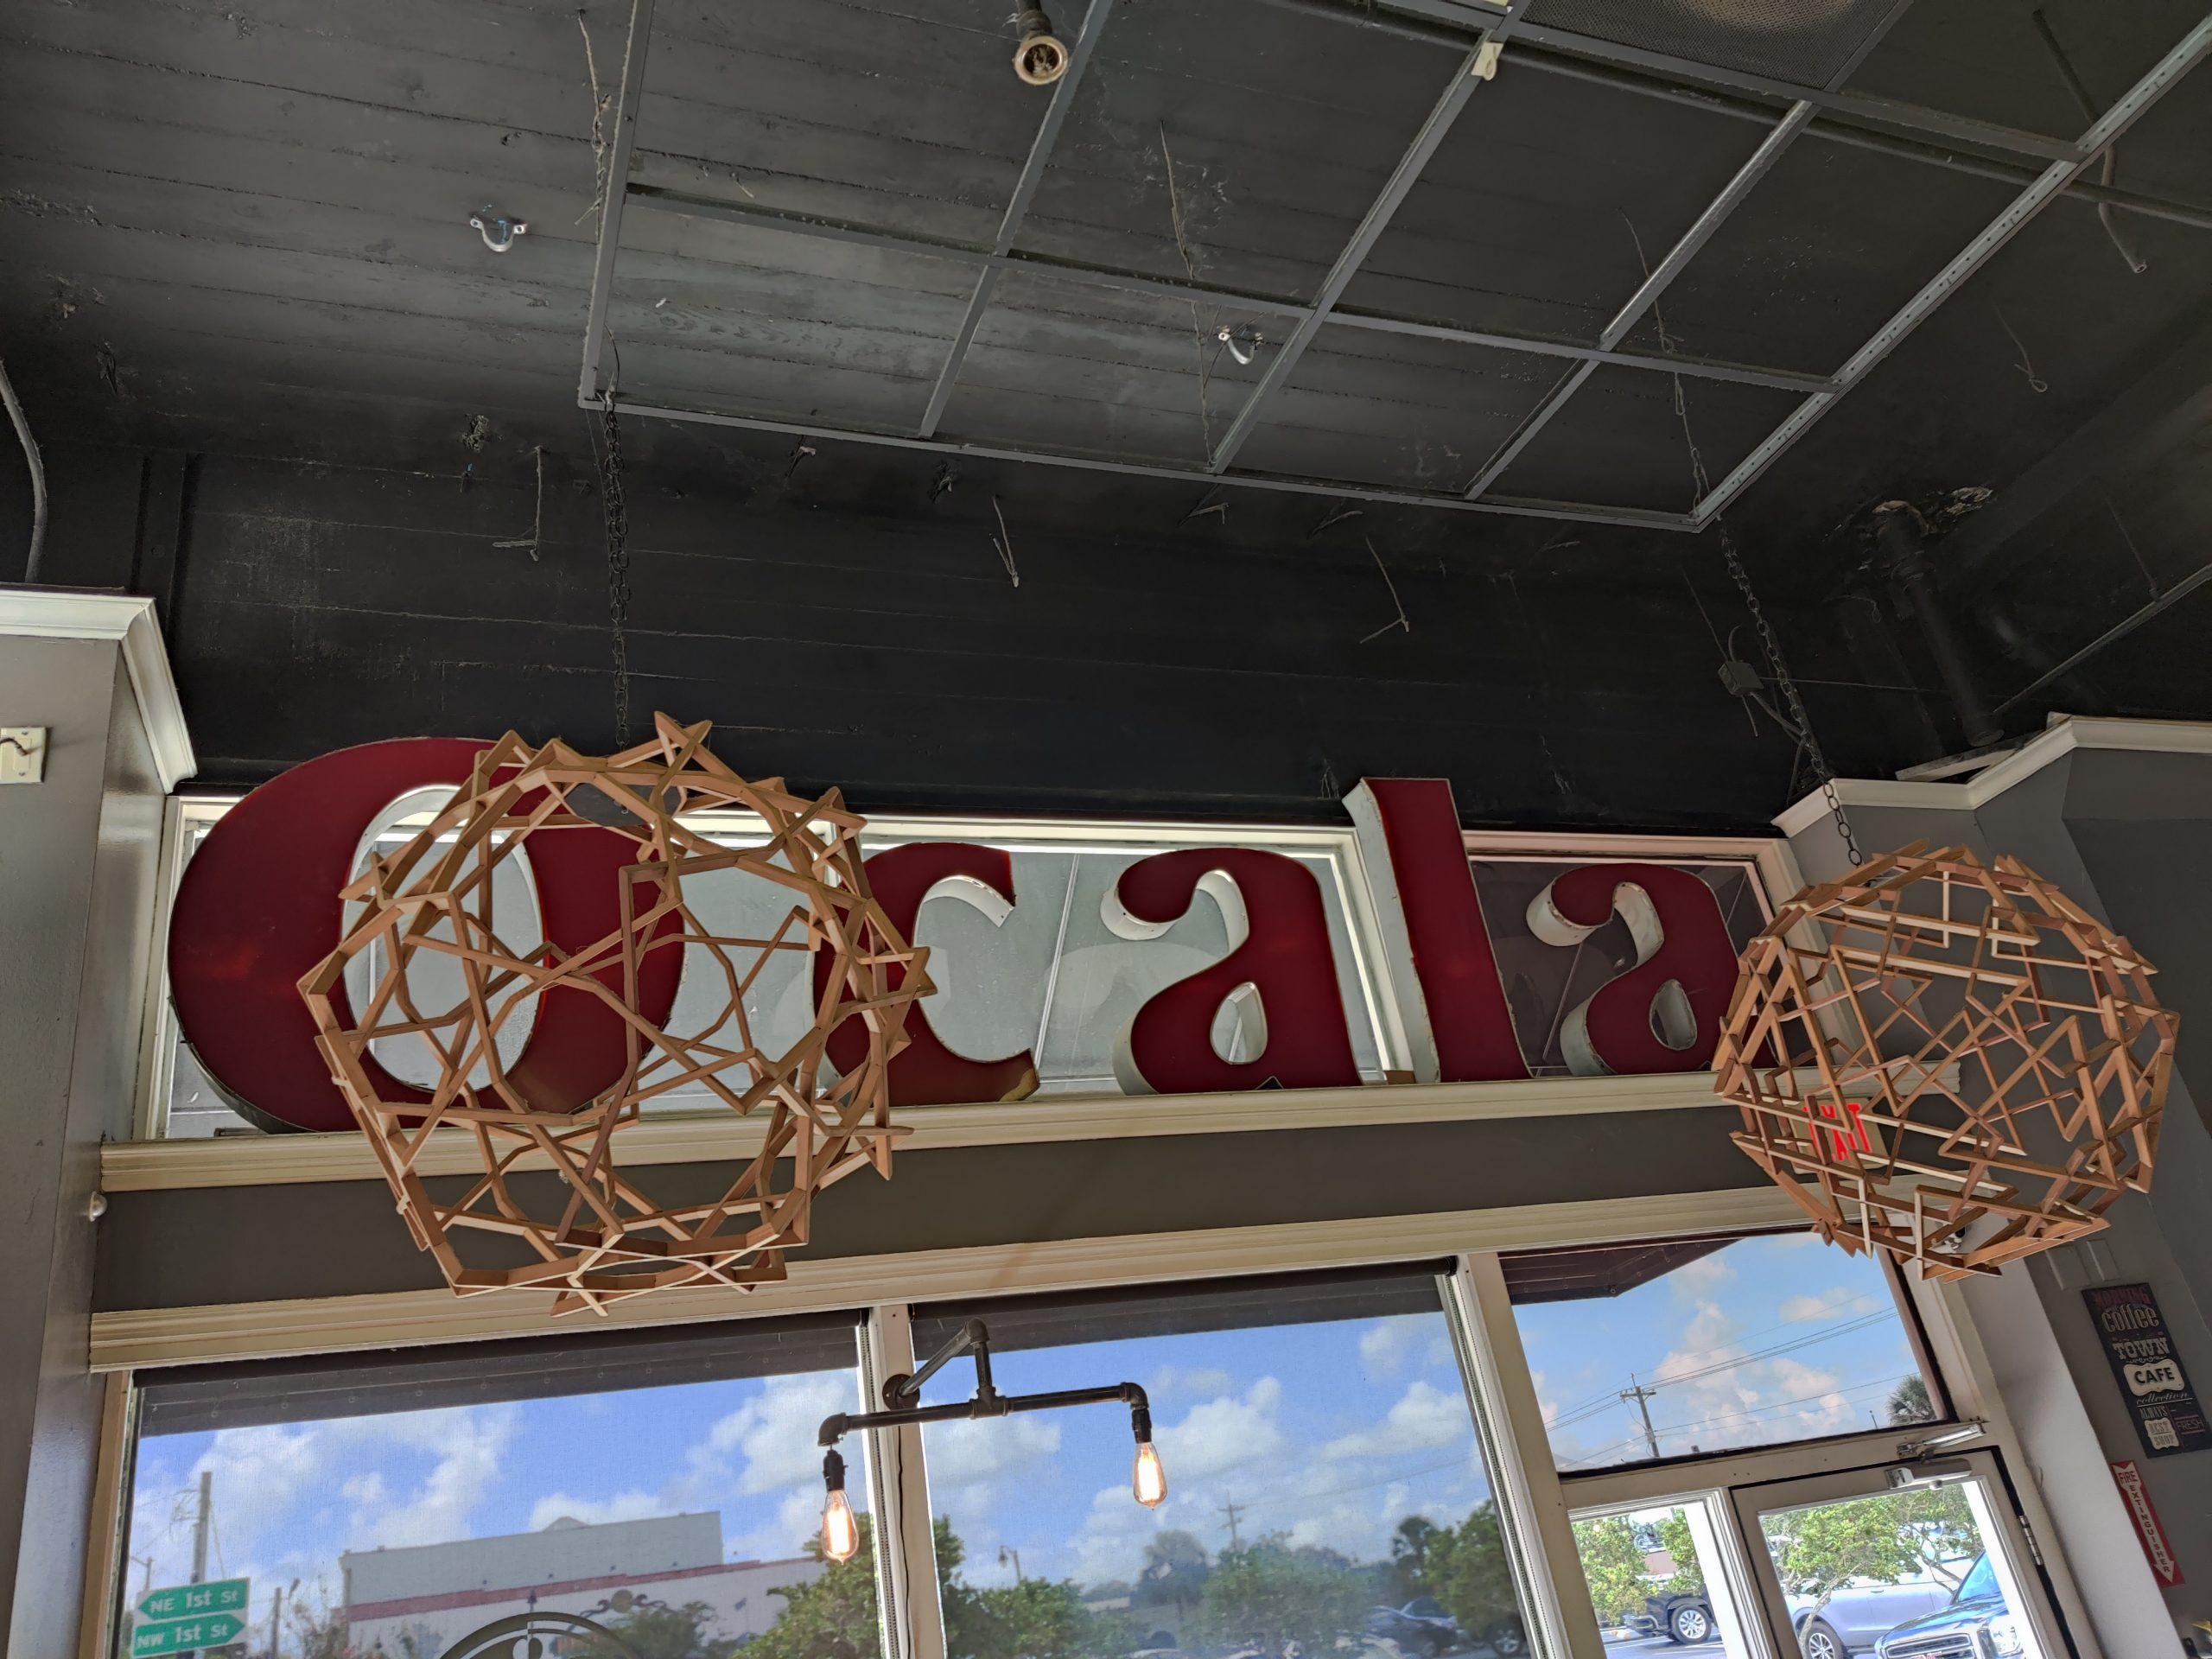 06-28-2021 Ocala Coffee & Crepes